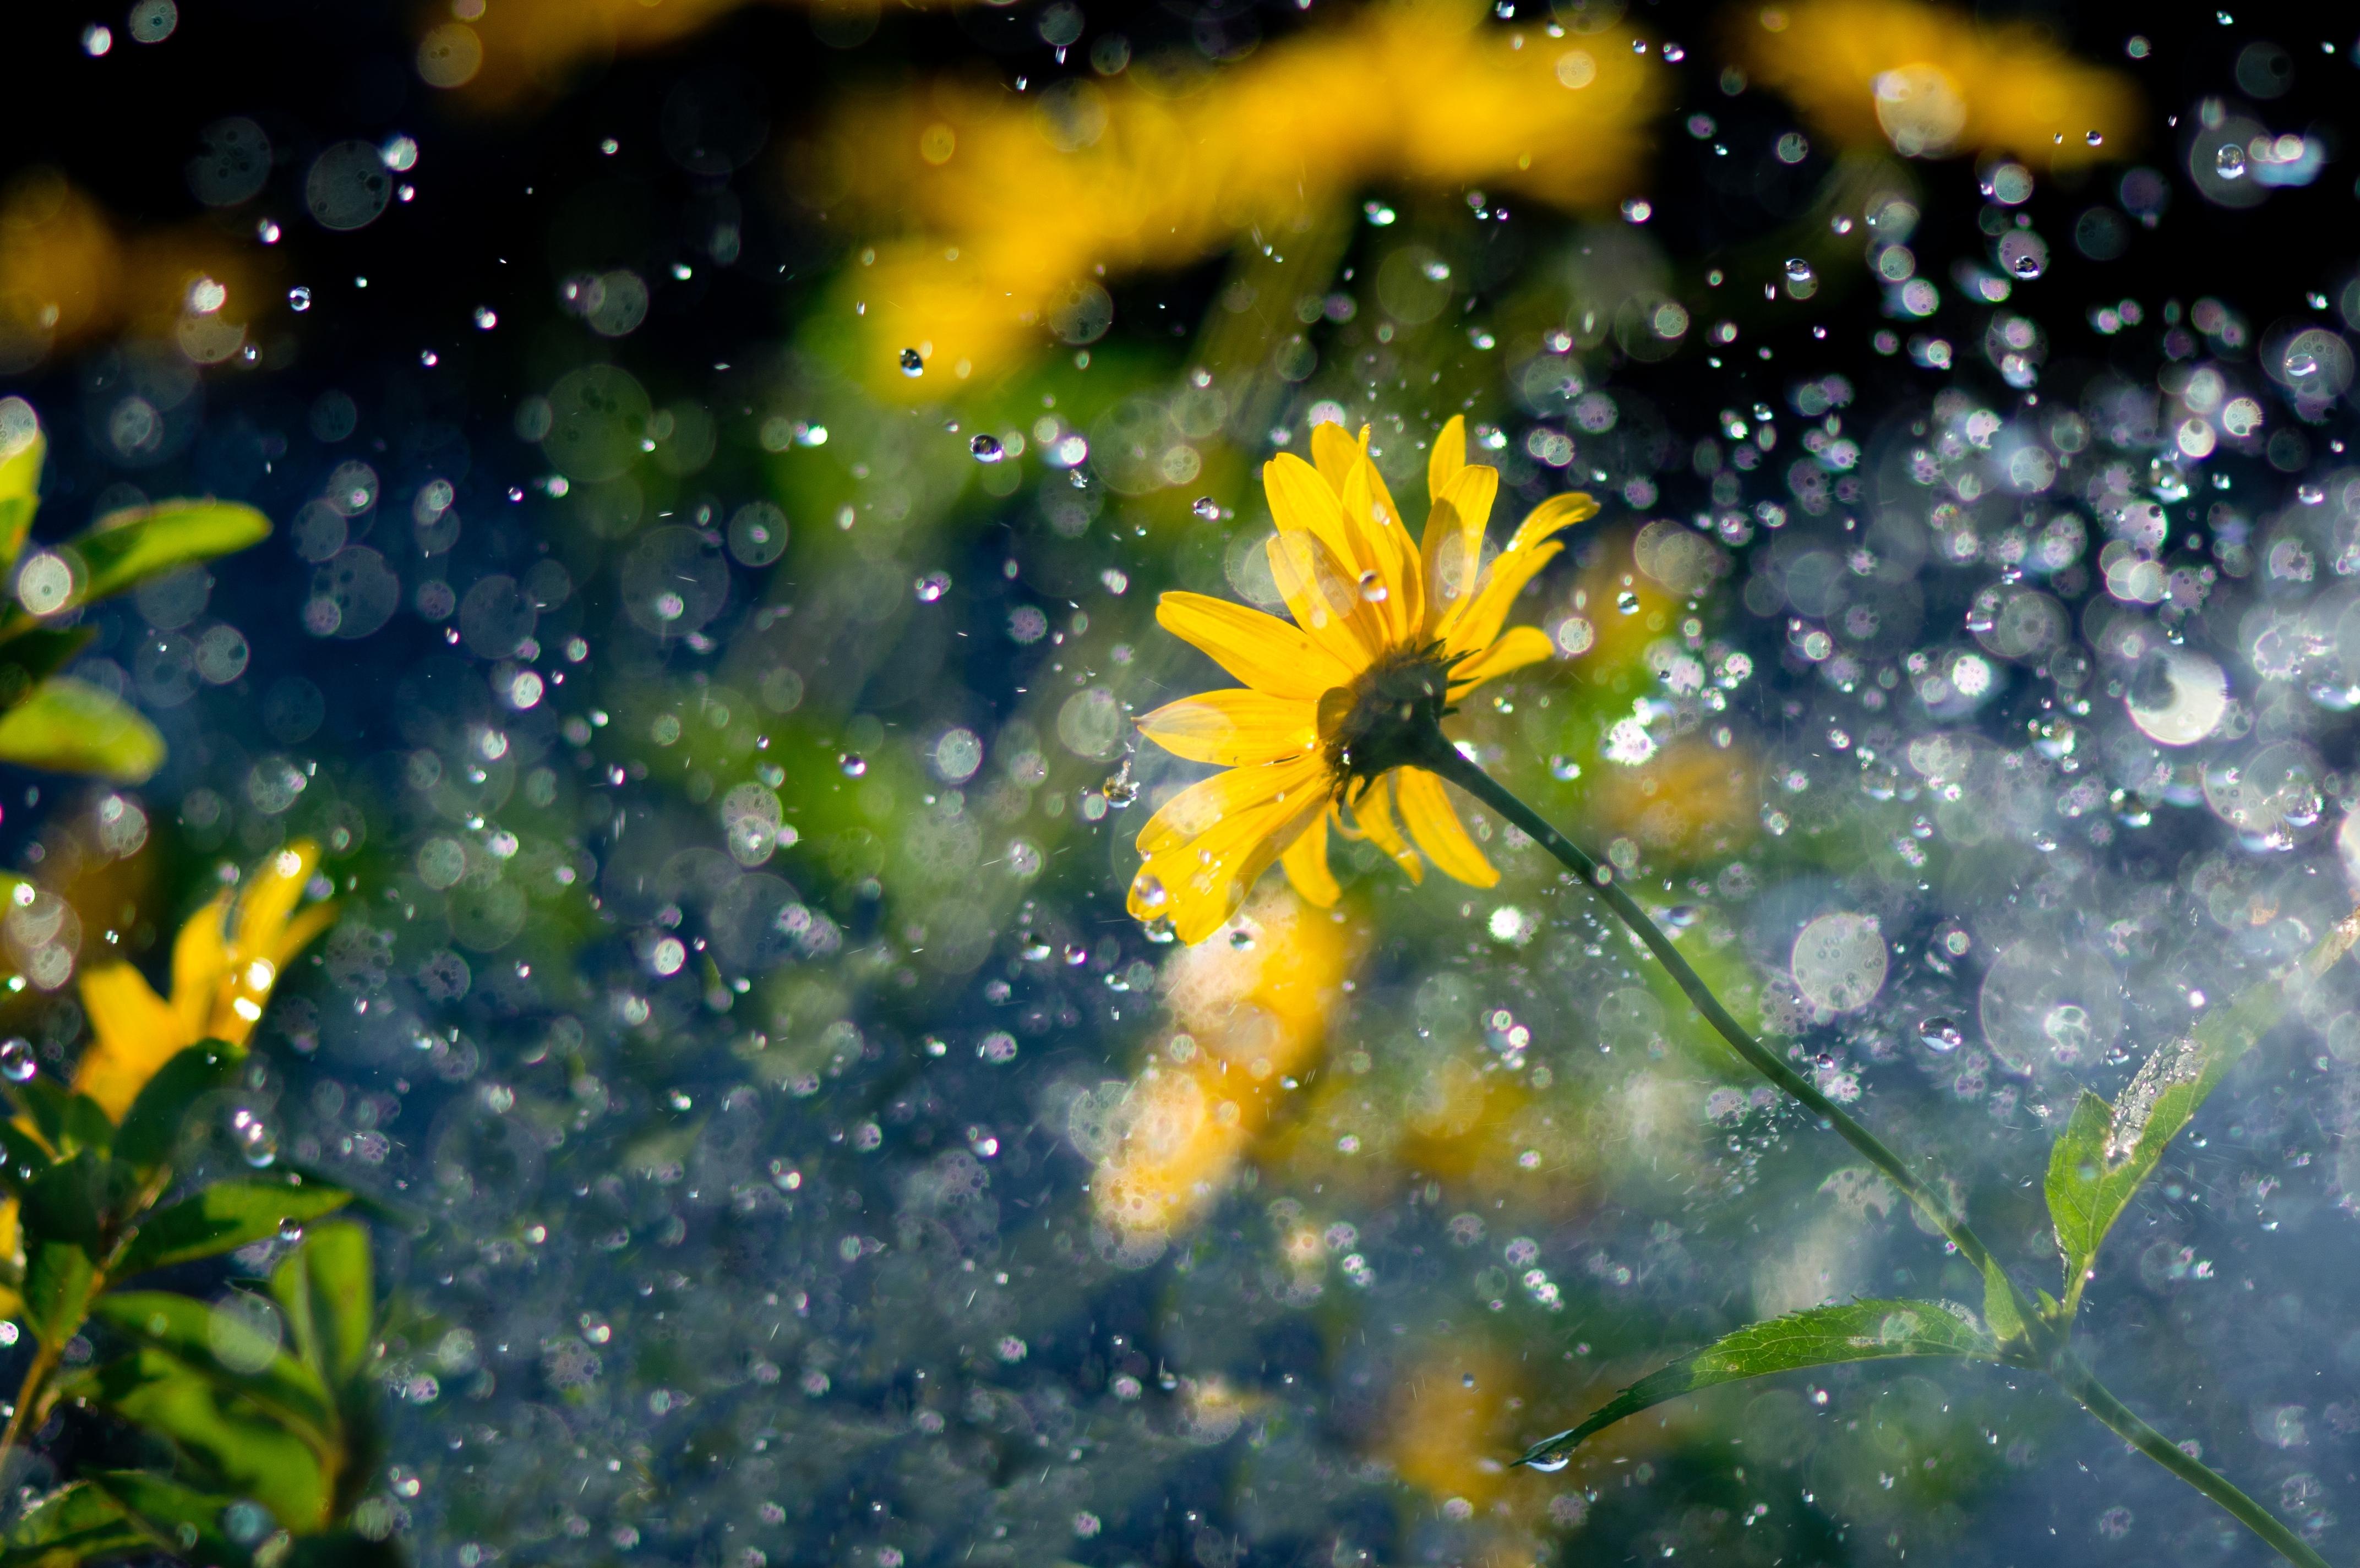 Обои на телефон лето цветы под дождем